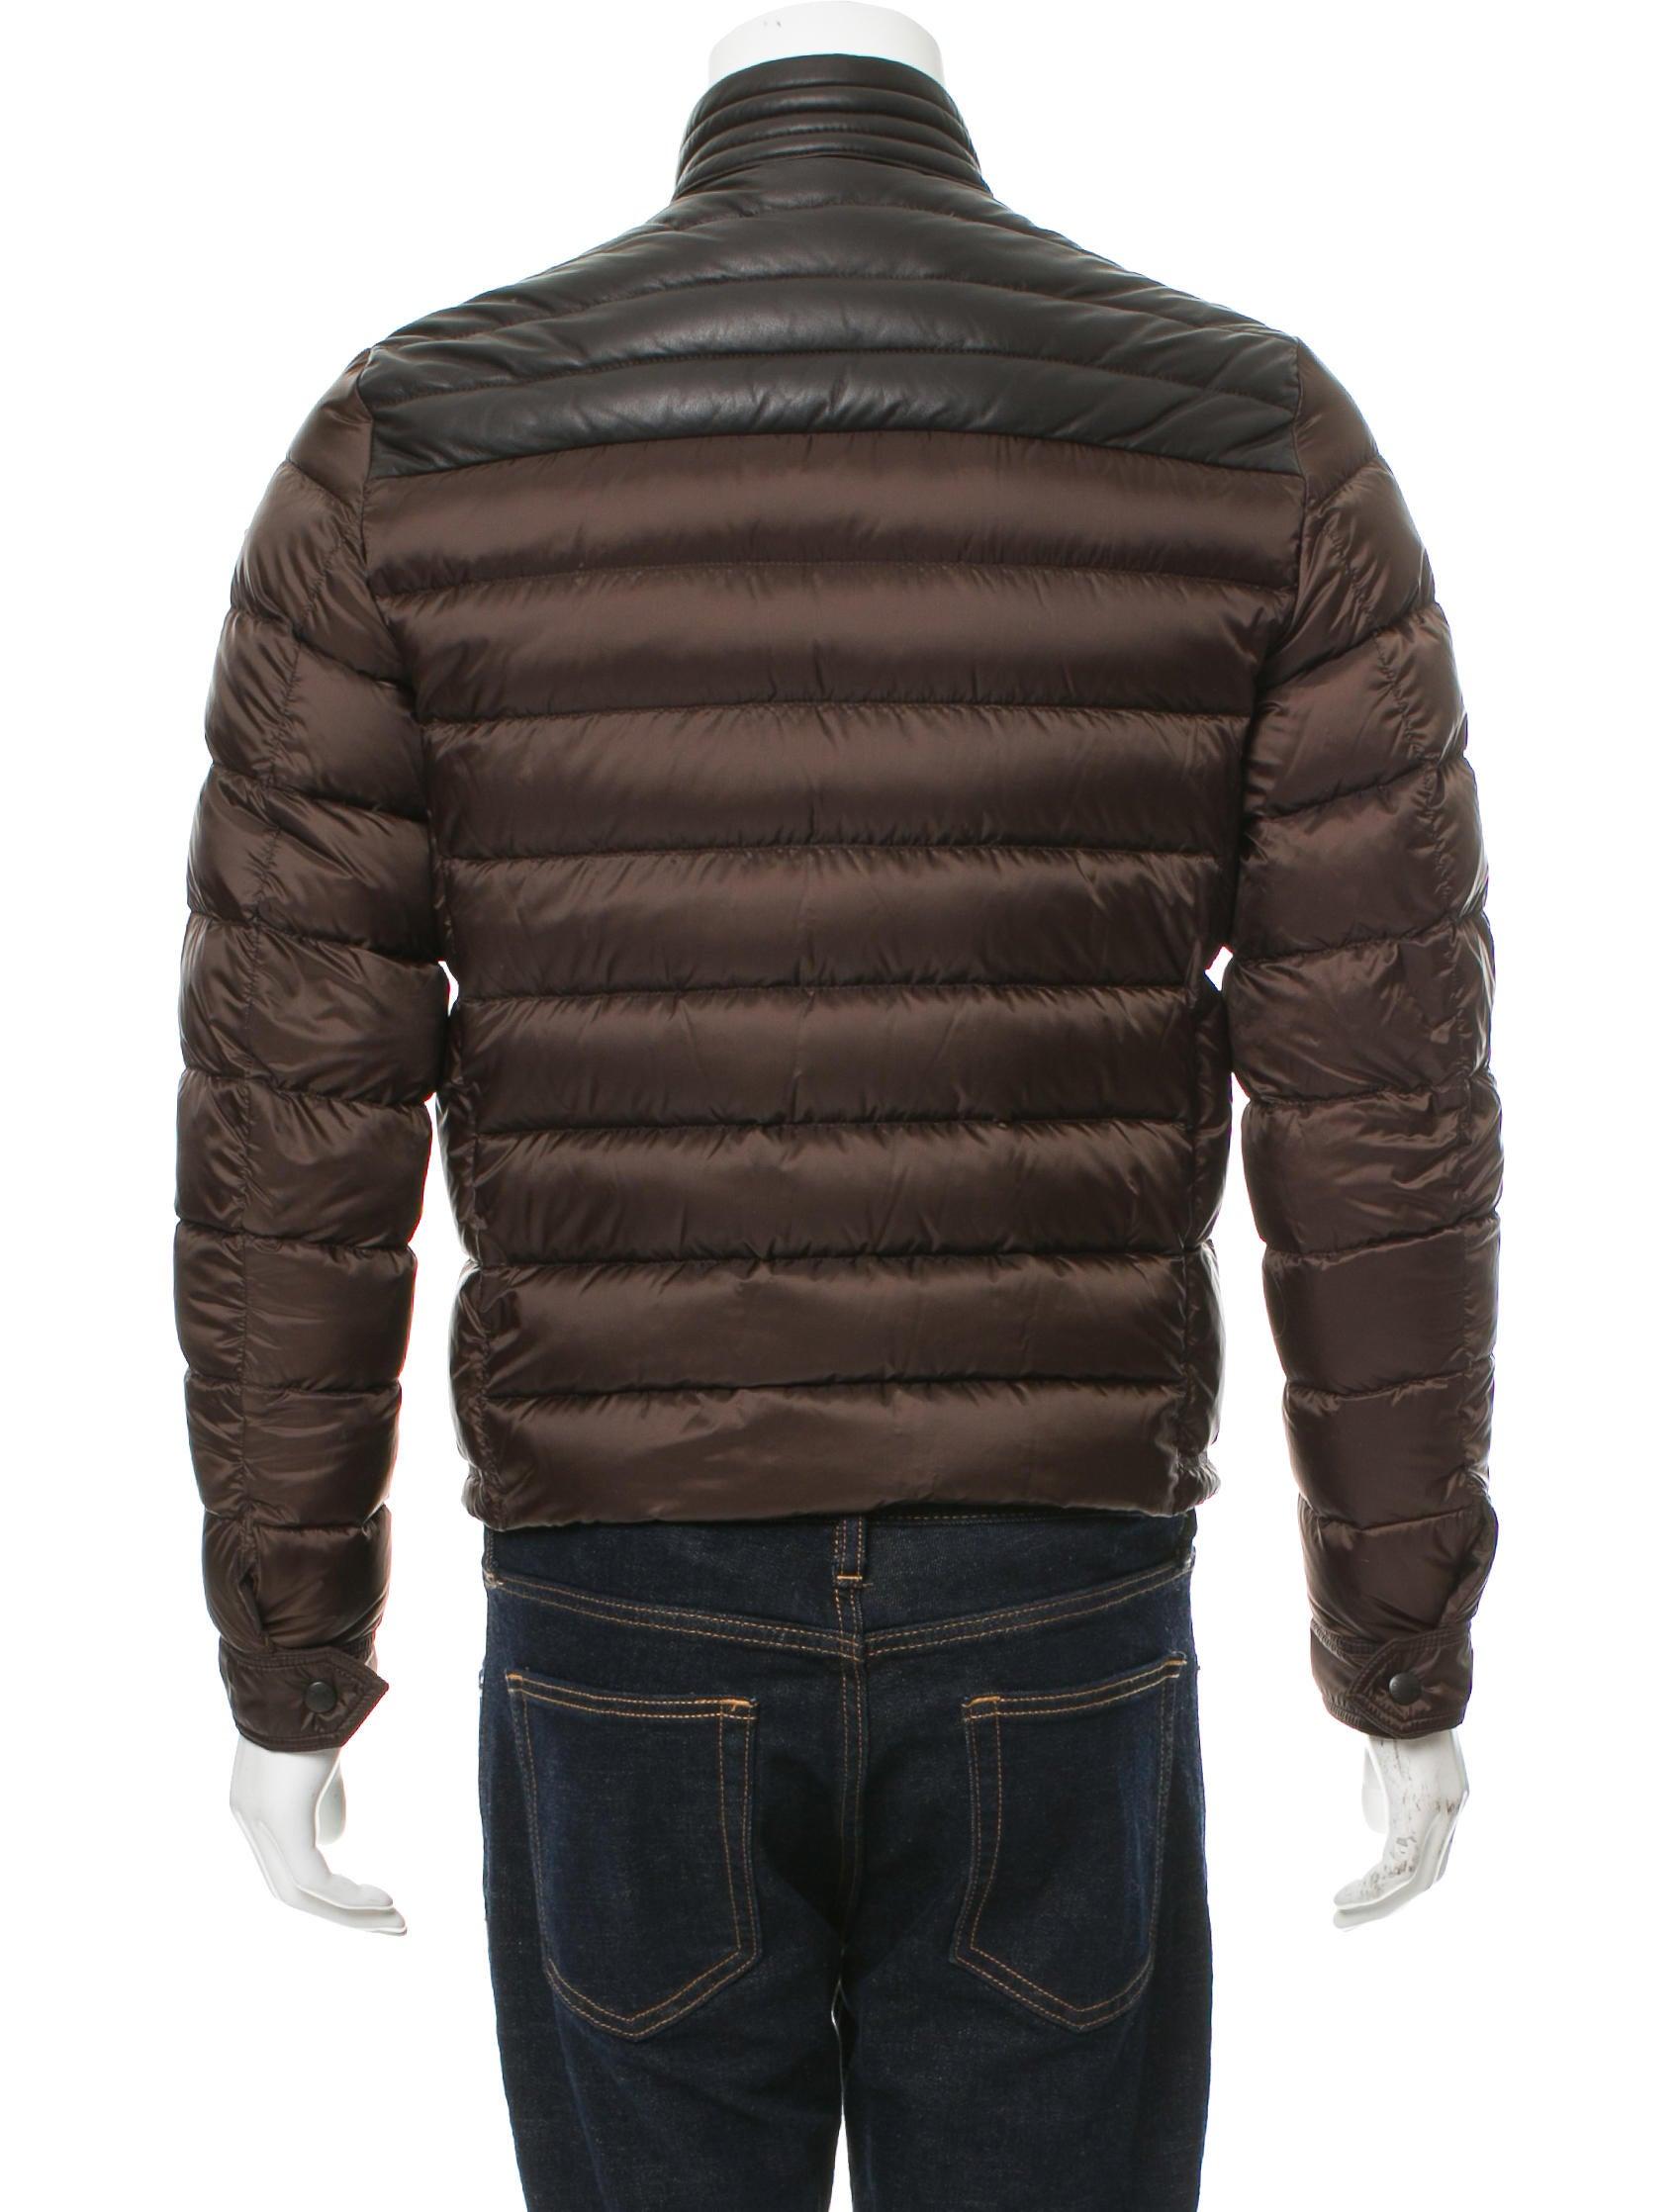 Details about Moncler Jeandat Leather Down Jacket